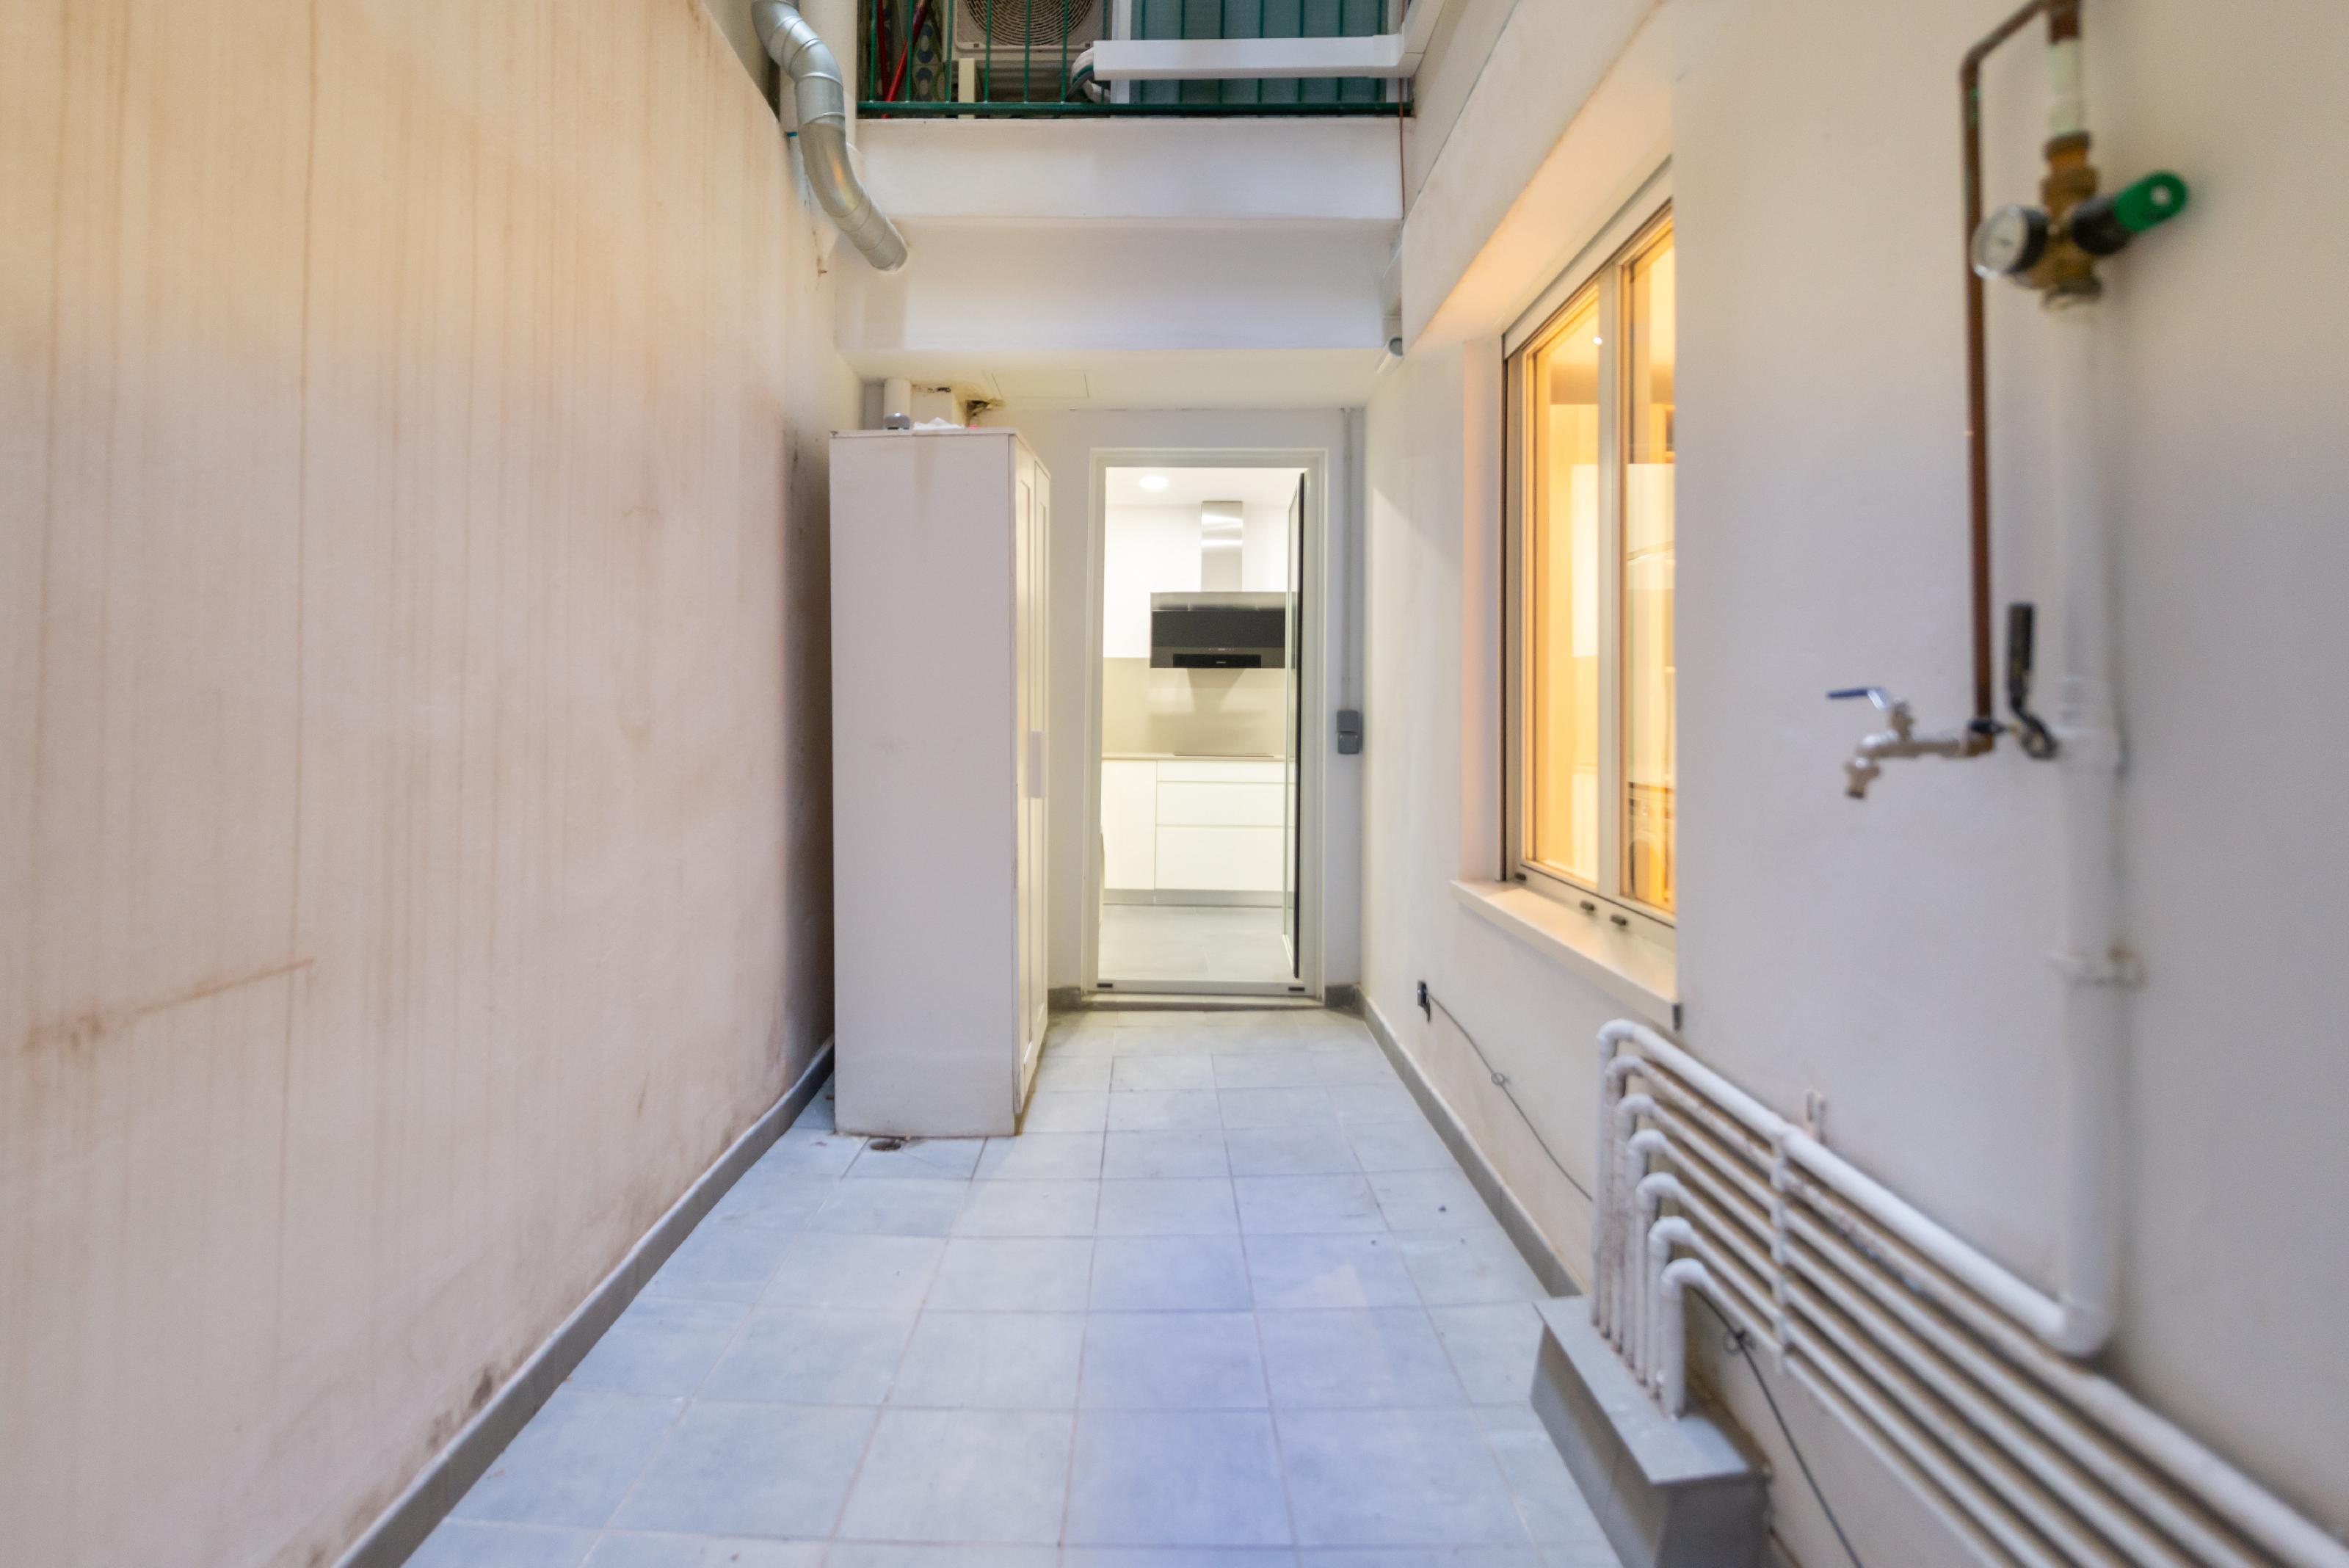 245231 Flat for sale in Sarrià-Sant Gervasi, Sant Gervasi-Galvany 13